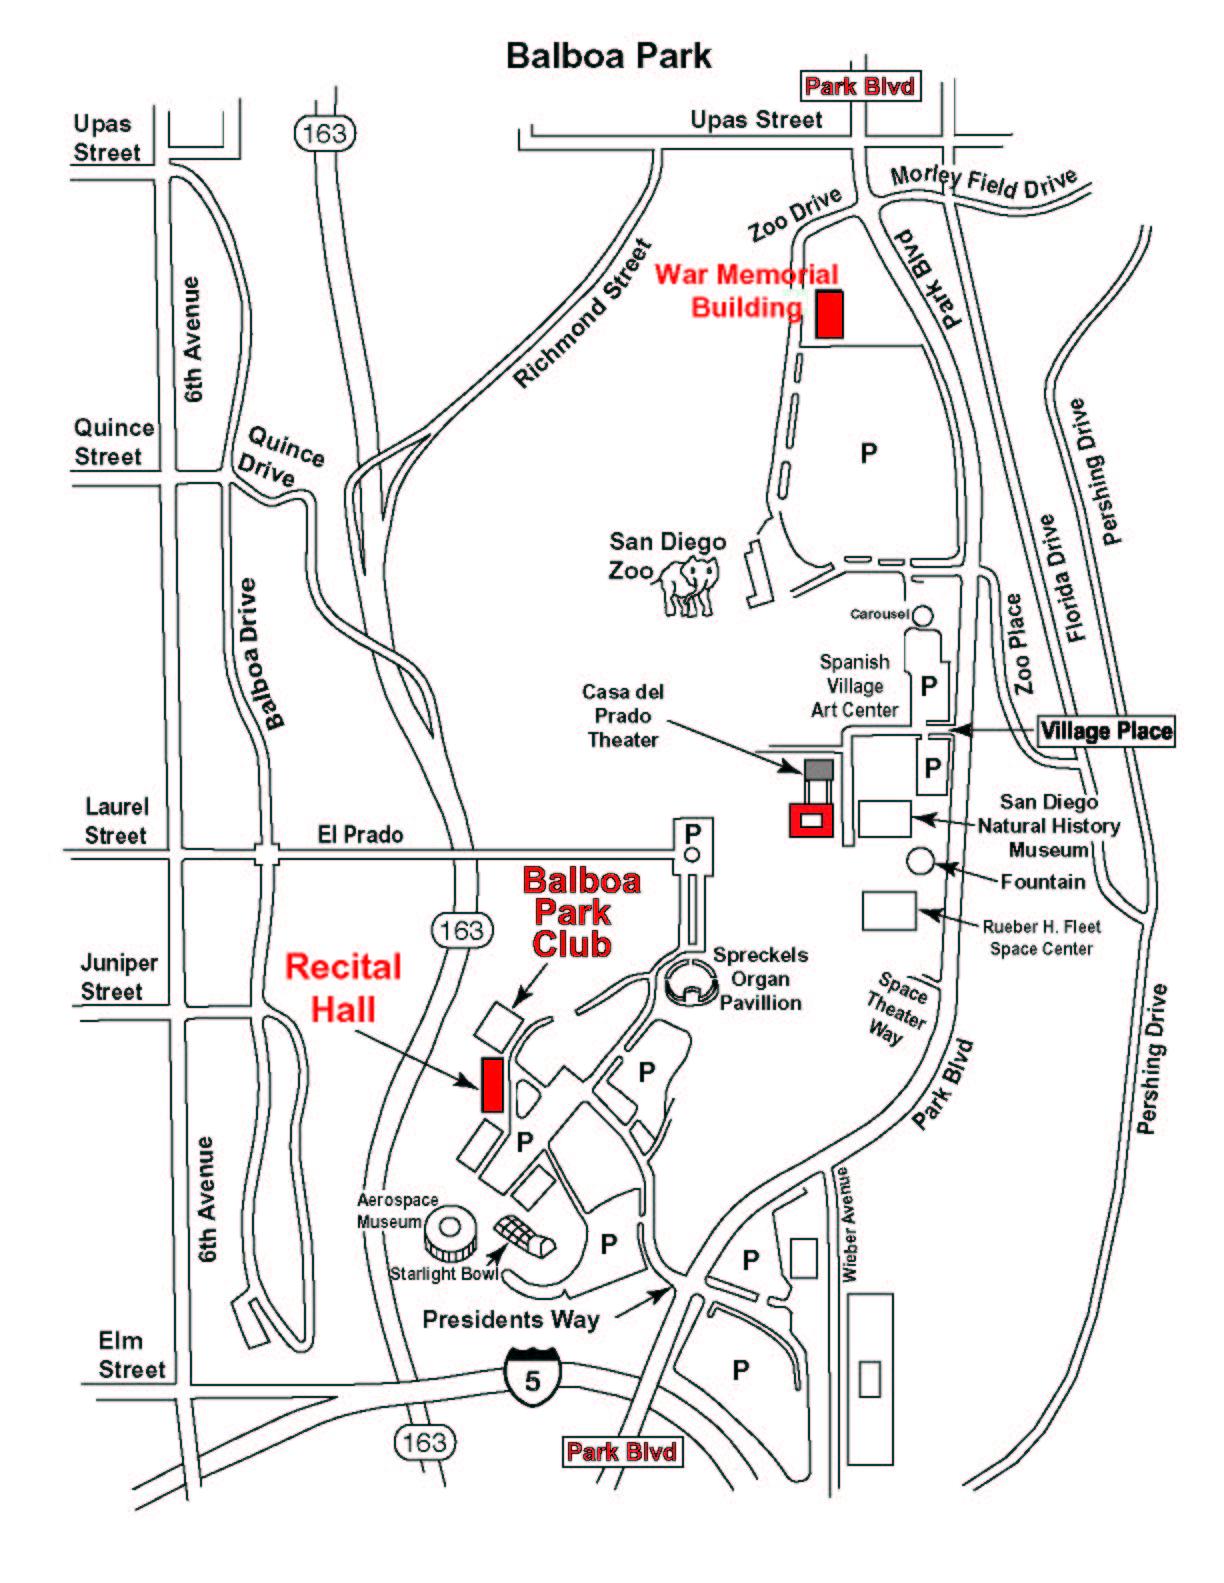 Map of Balboa Park Map Balboa Park on rockridge map, carlsbad map, prado park lake map, la jolla cove map, vondelpark map, glen park ca map, seaworld map, huntington library map, old mission dam map, golden gate national recreation area map, north park map, mission trails regional park map, panama location on world map, carmel mountain ranch map, south park map, lake balboa map, san diego map, presidio park map, amelia earhart park map, petco park map,